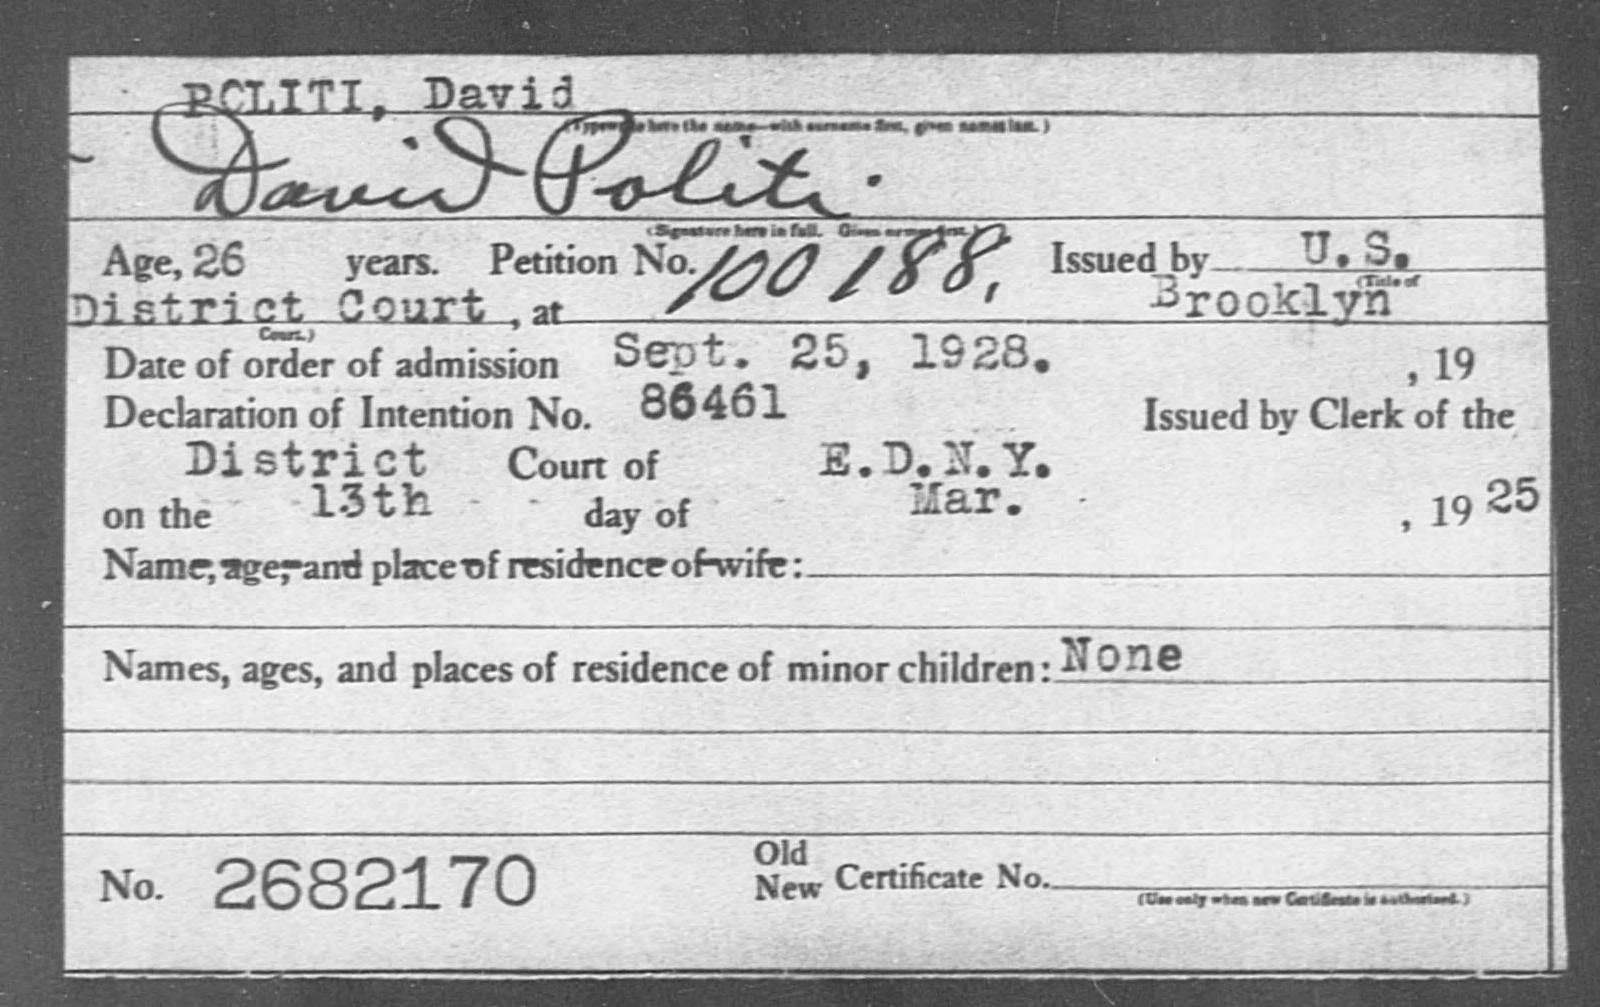 POLITI, David - Born: [BLANK], Naturalized: 1928